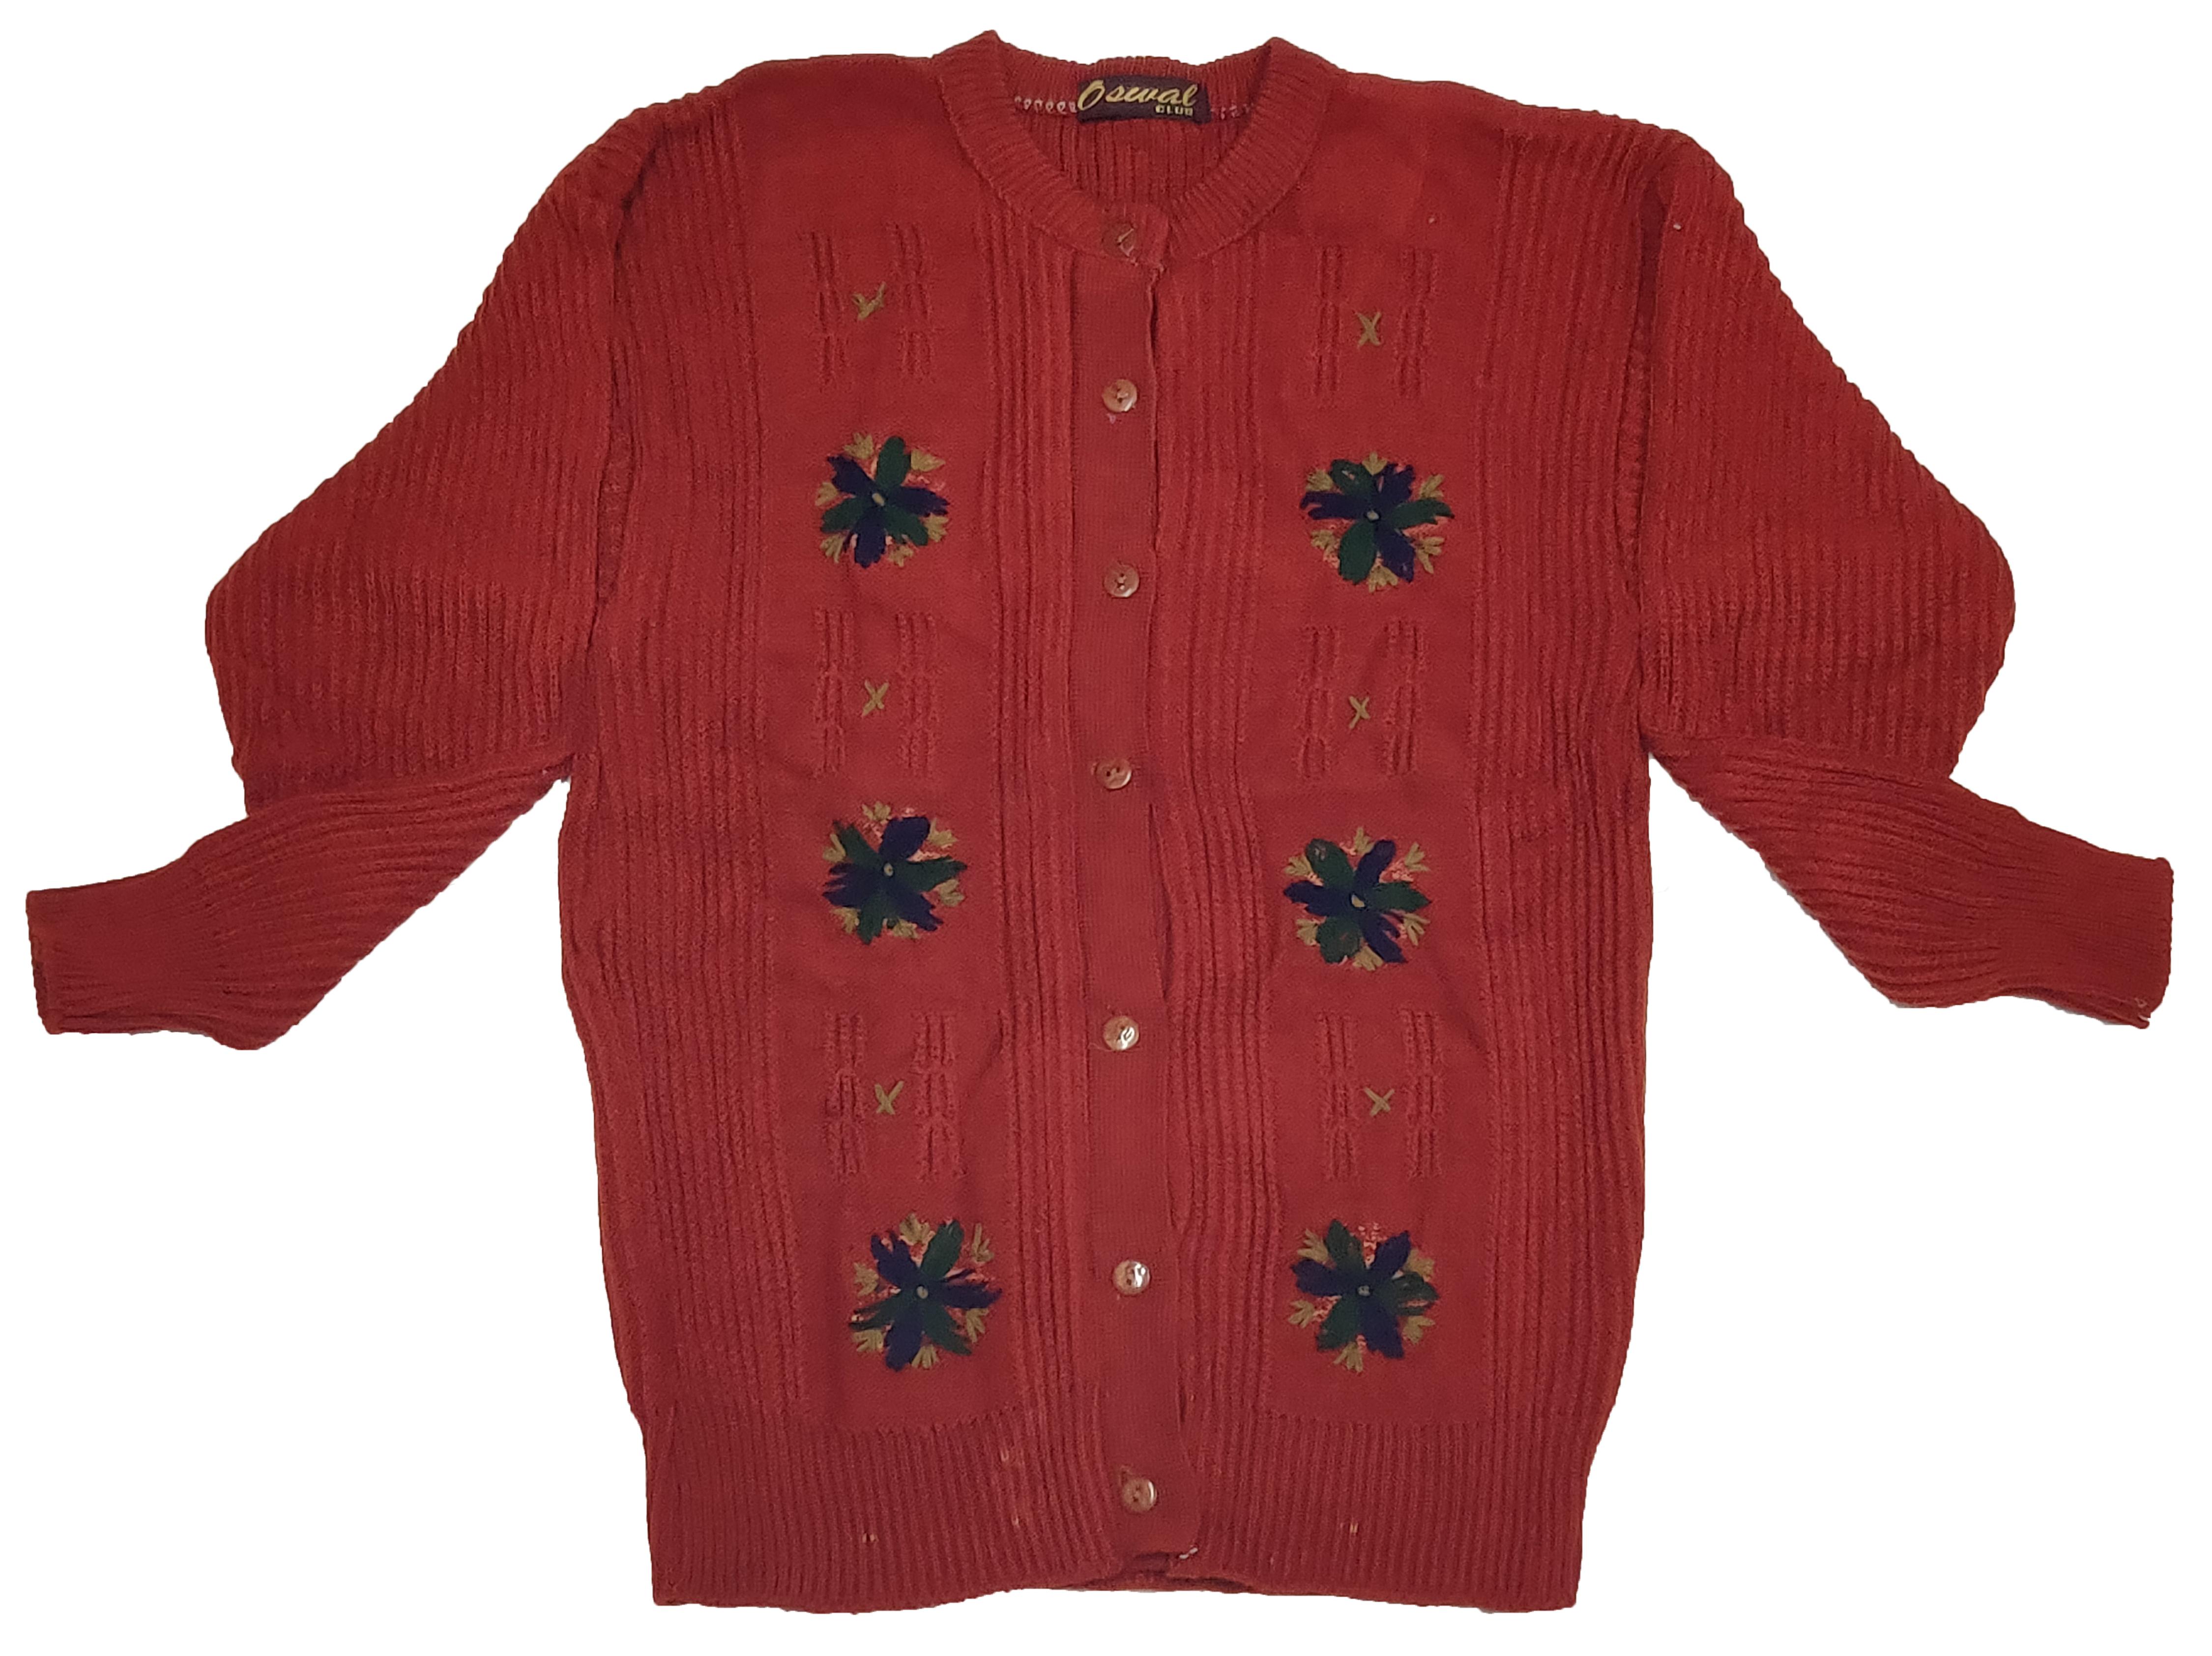 Oswal Wollen Ladies Sweater ( 3 Pcs ) (XL, 265)